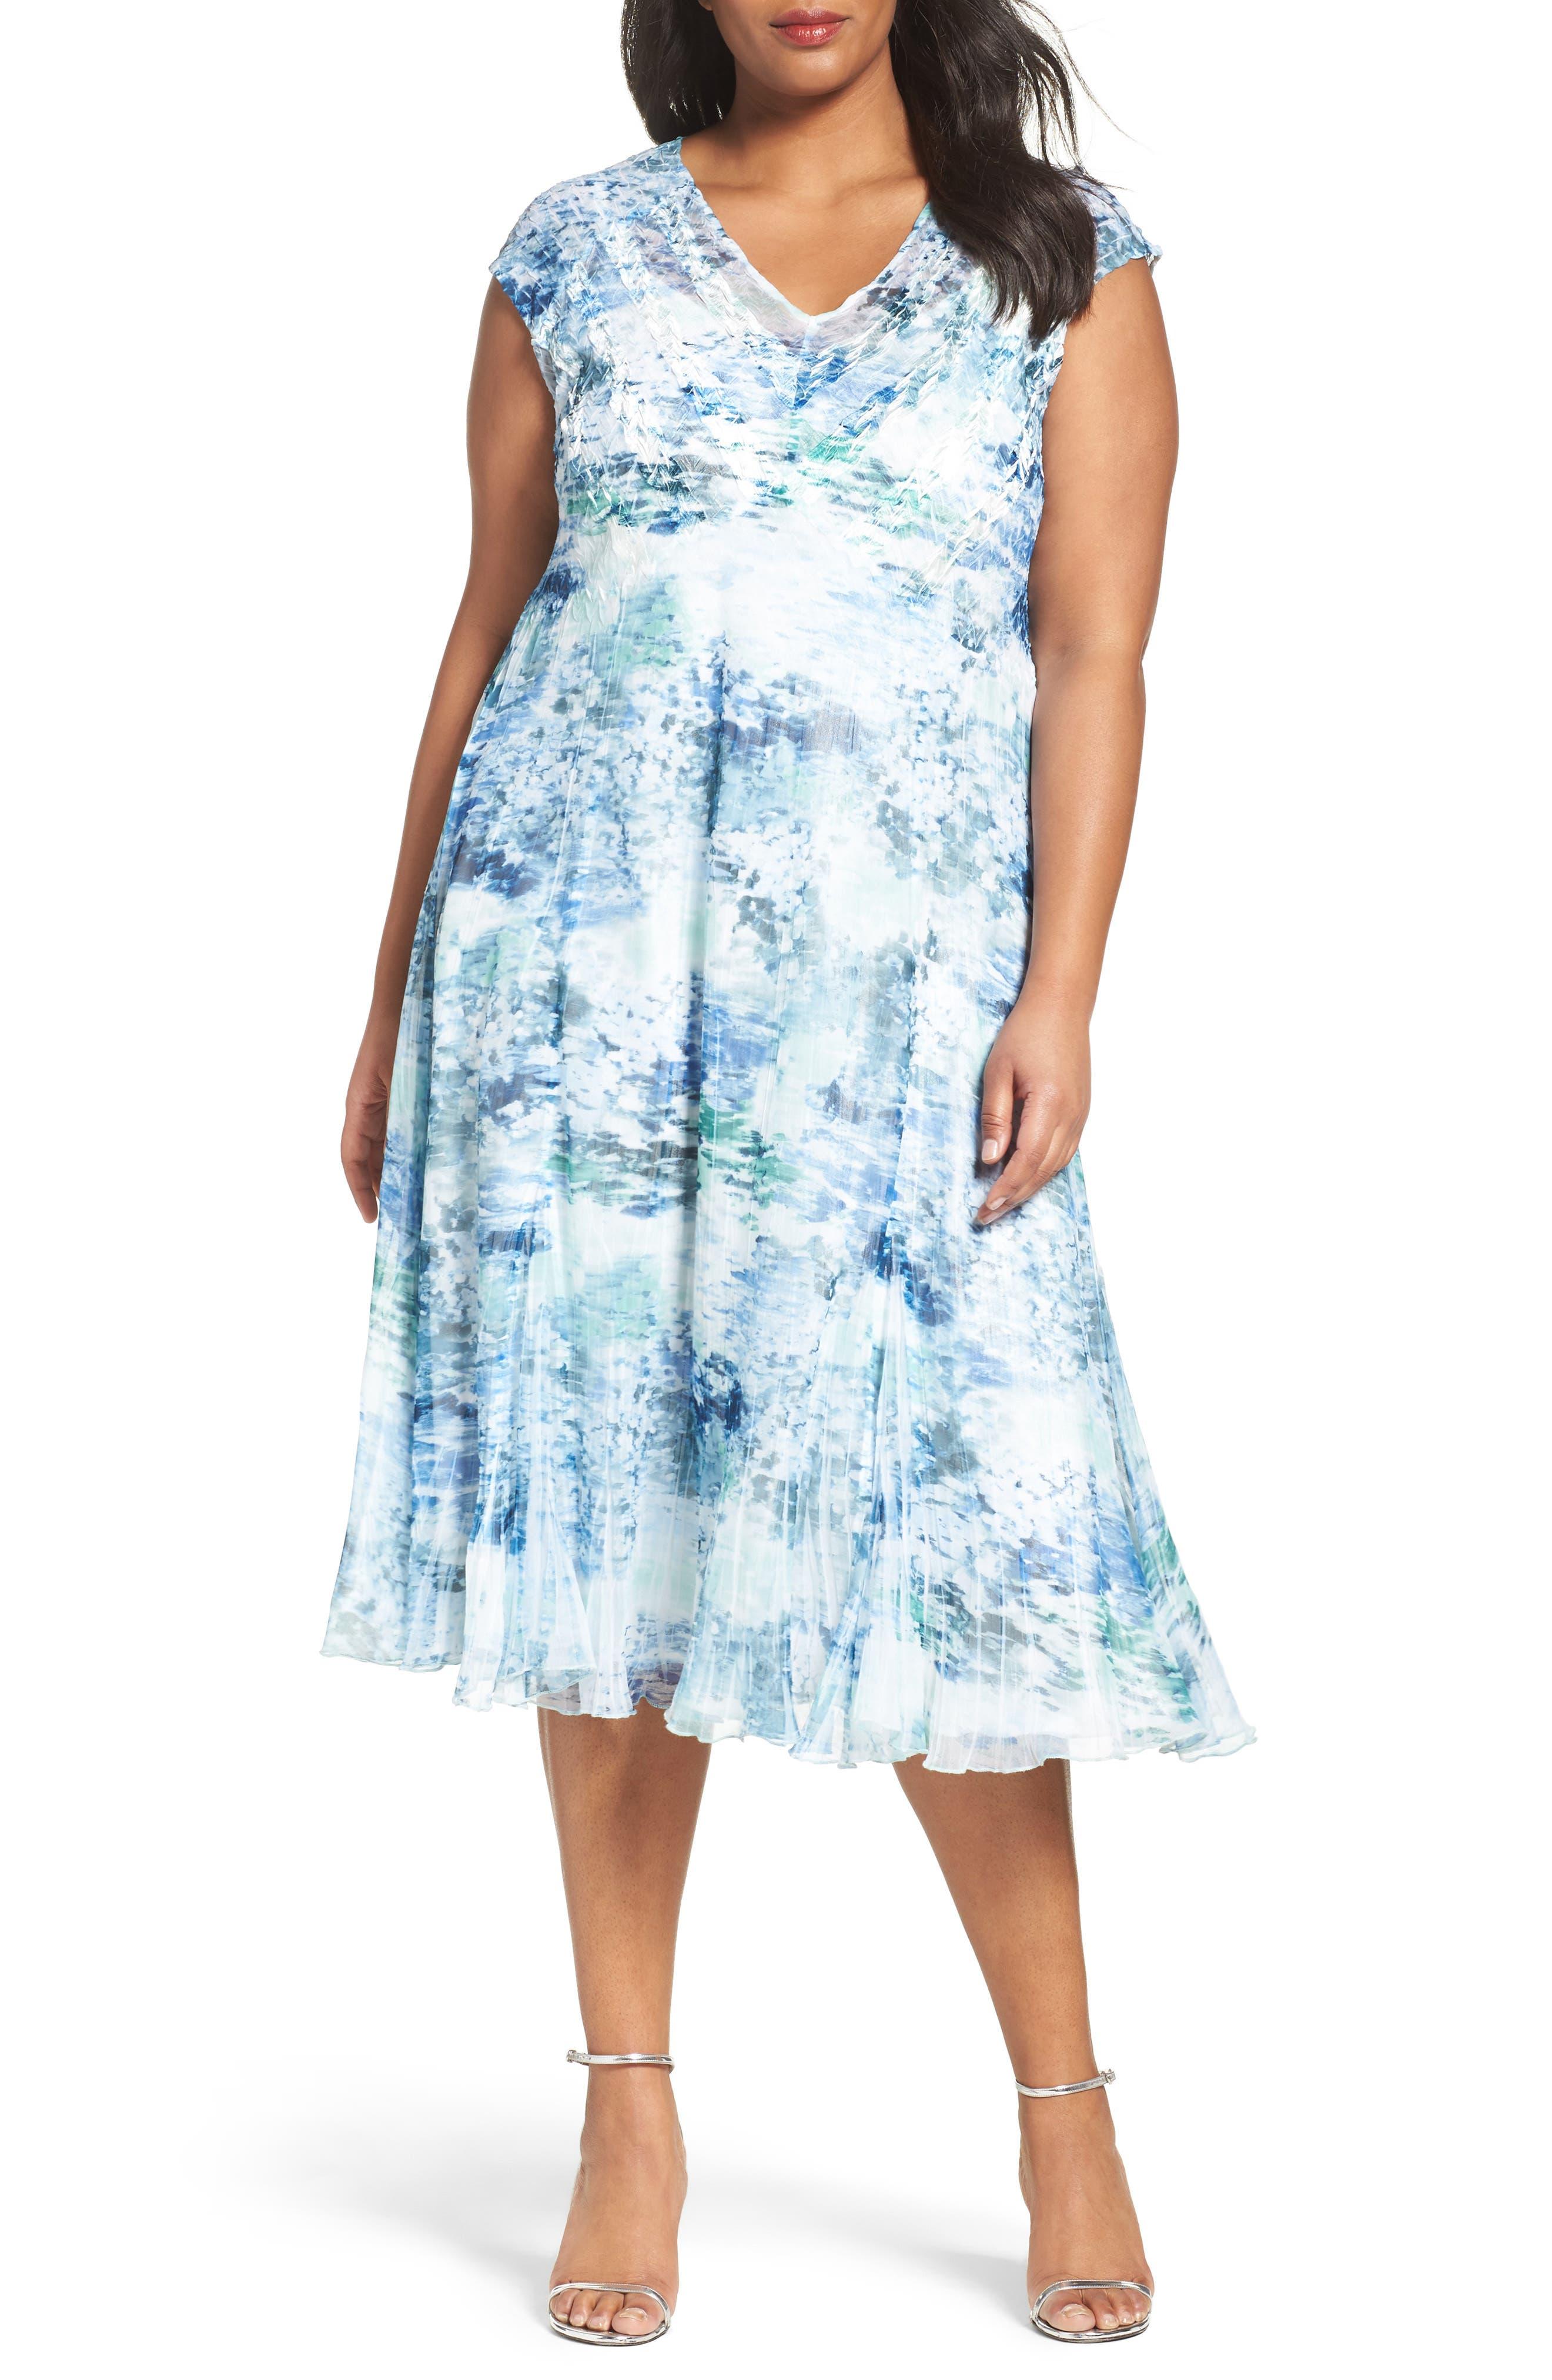 Alternate Image 1 Selected - Komarov Print Chiffon A-Line Dress (Plus Size)